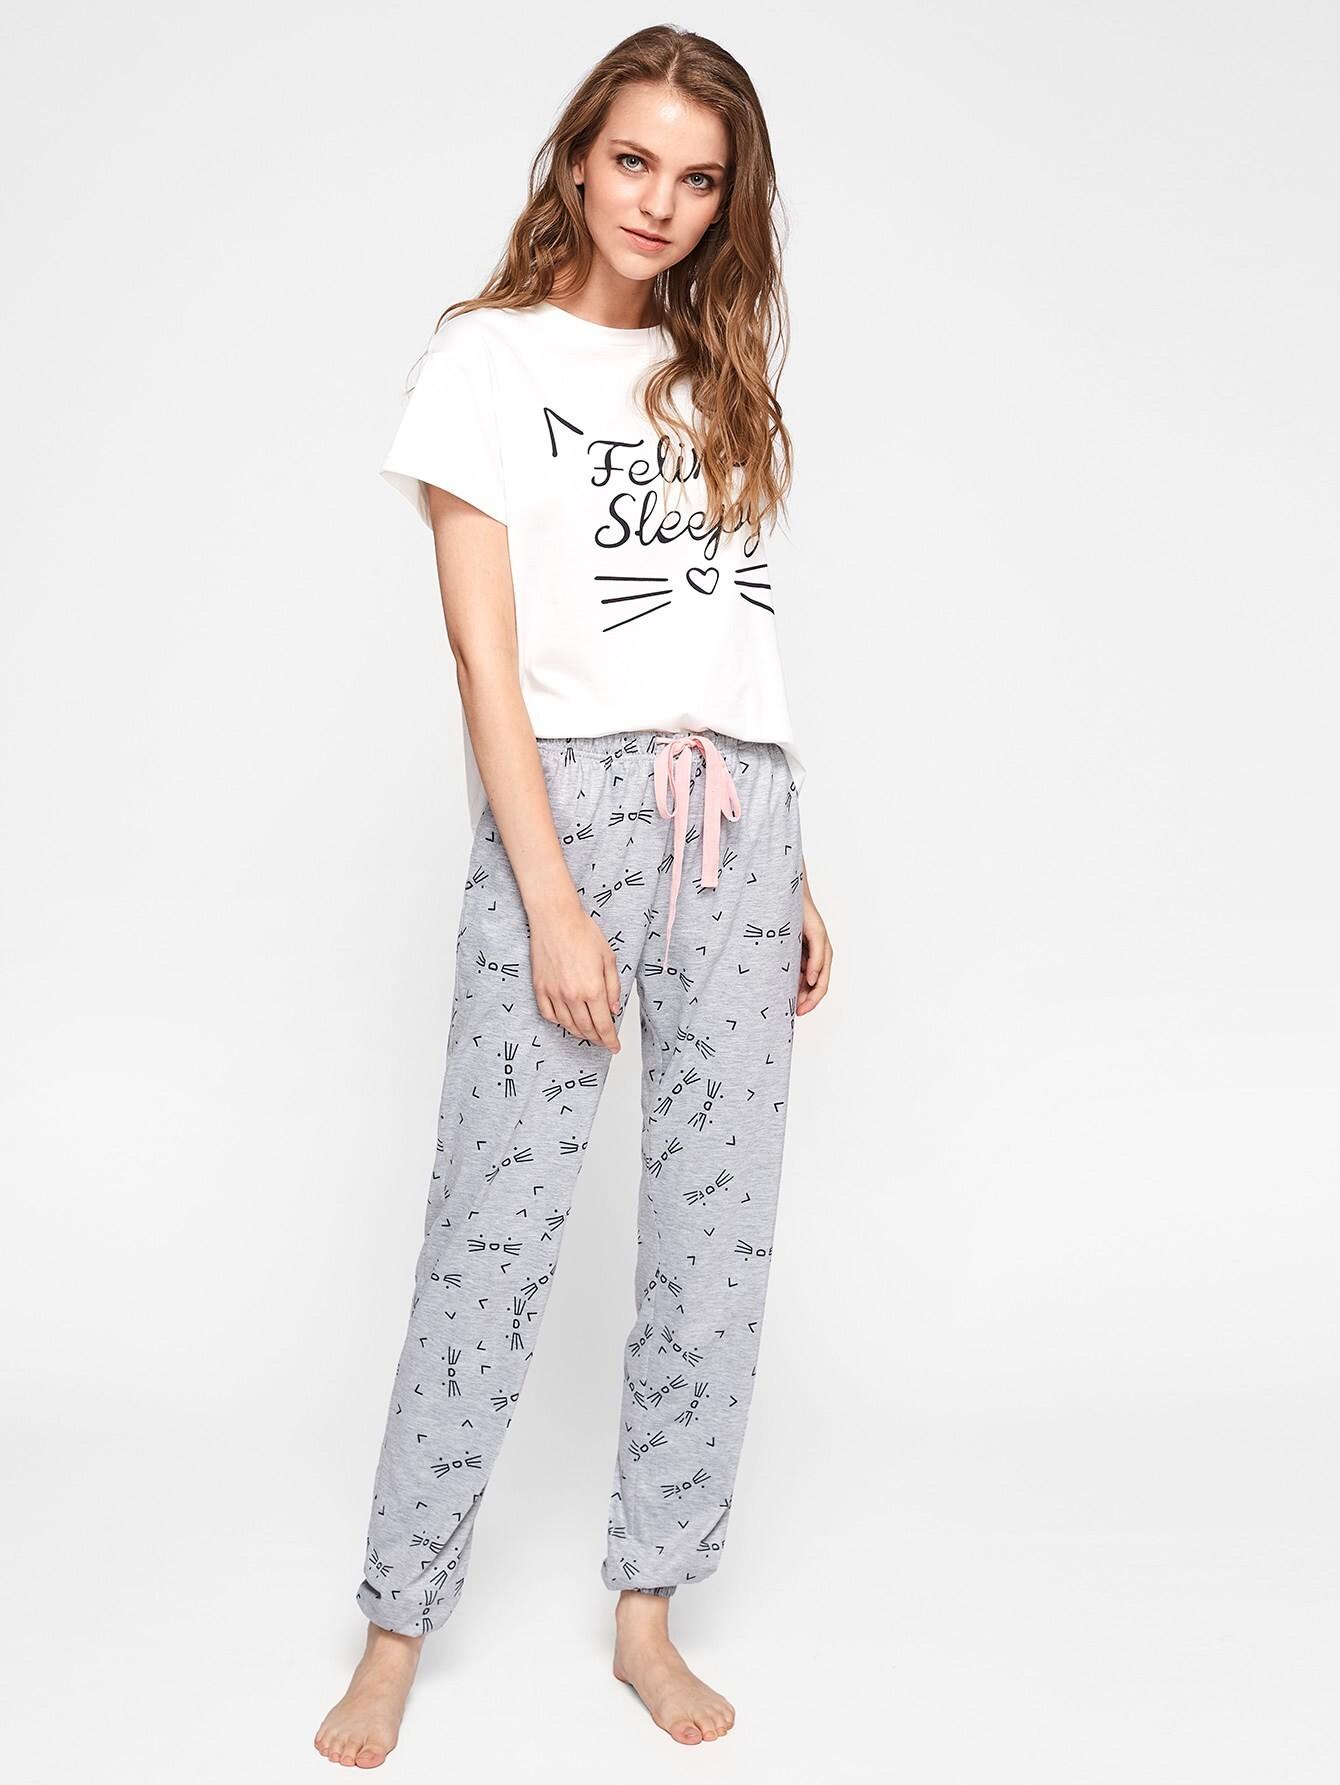 Cat Pattern Print Top And Pants Pajama Set flamingo and jungle leaf print top and pants pajama set